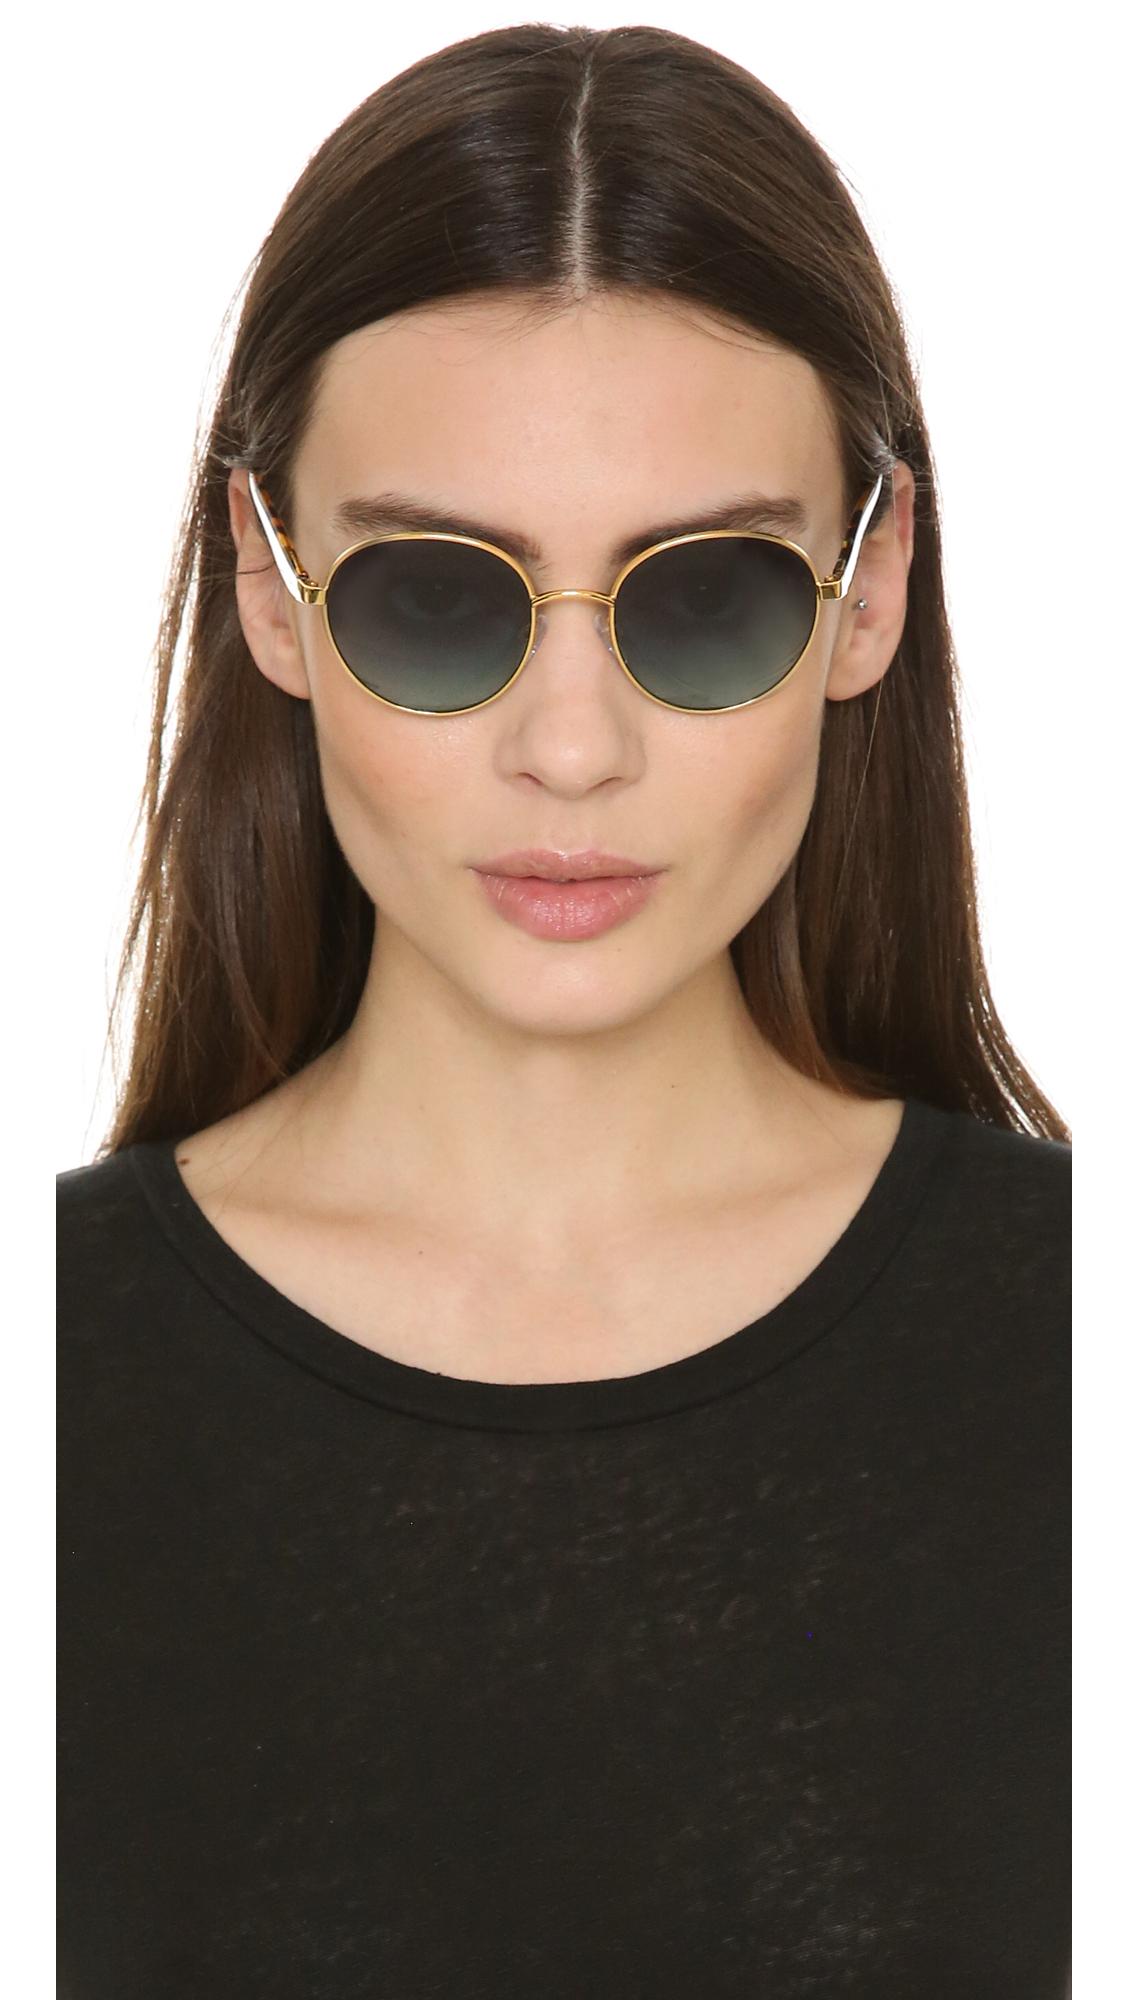 884194ed1f33 Michael Kors Sadie Iii Sunglasses - Gold/teal Gradient in Metallic ...